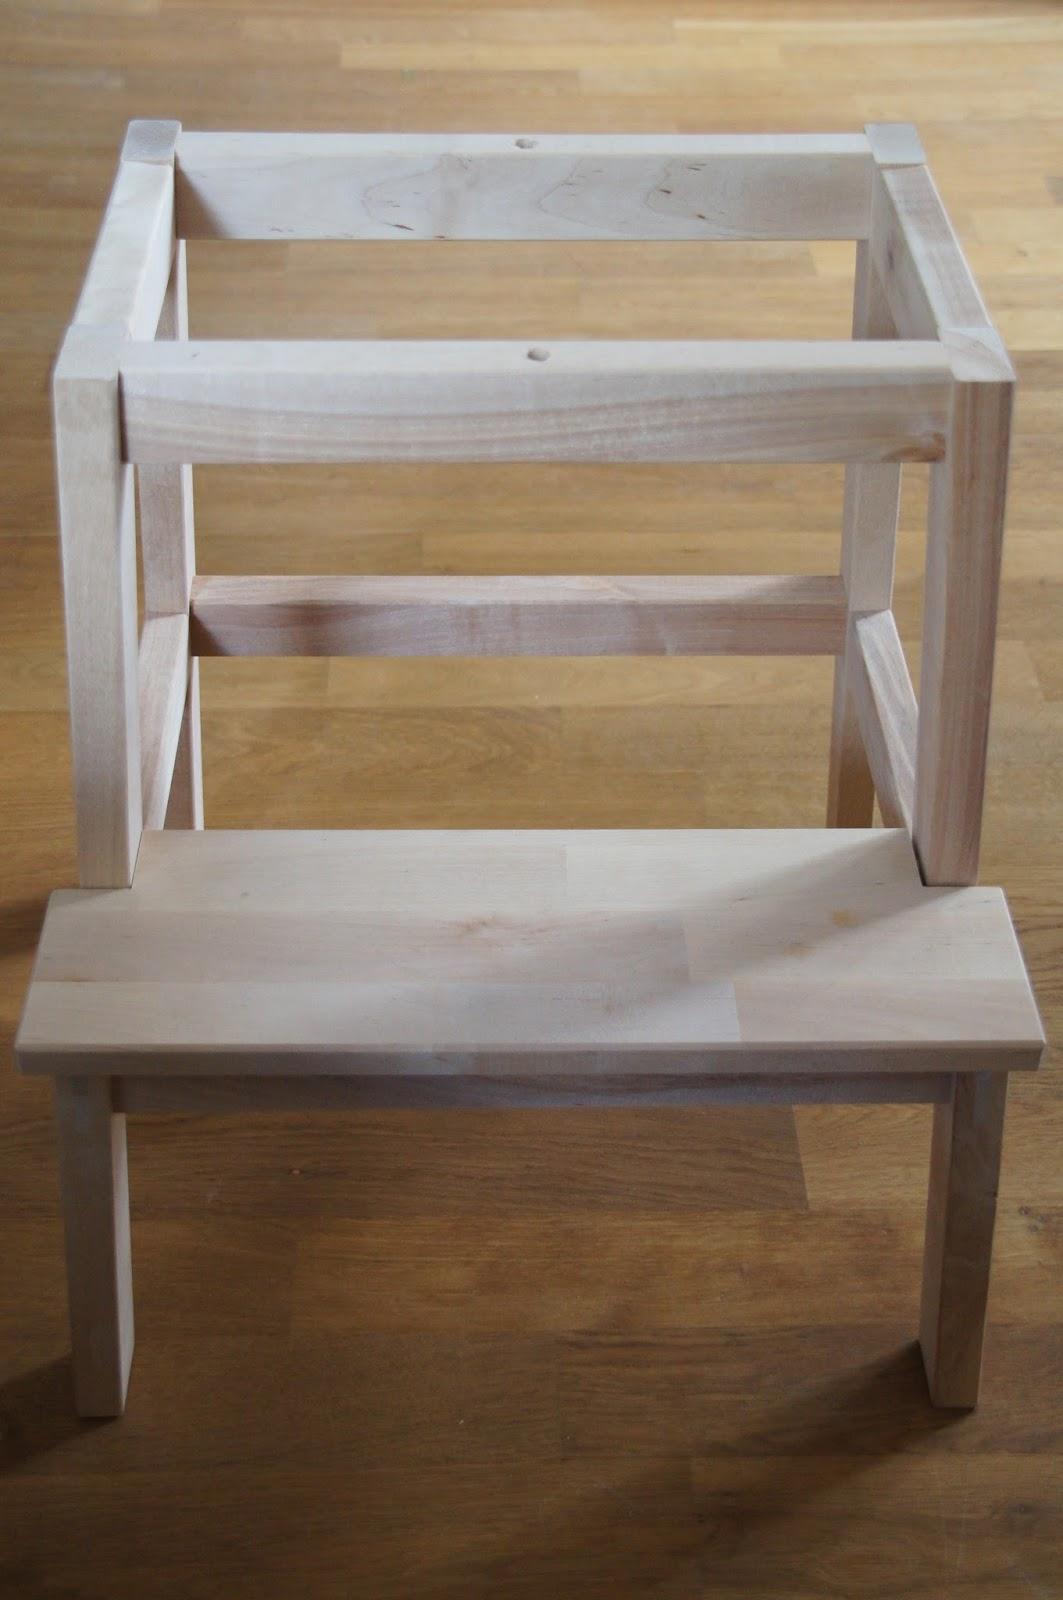 gl cksfl gel bauanleitung f r einen learning tower lernturm aus ikea hocker bekv m. Black Bedroom Furniture Sets. Home Design Ideas